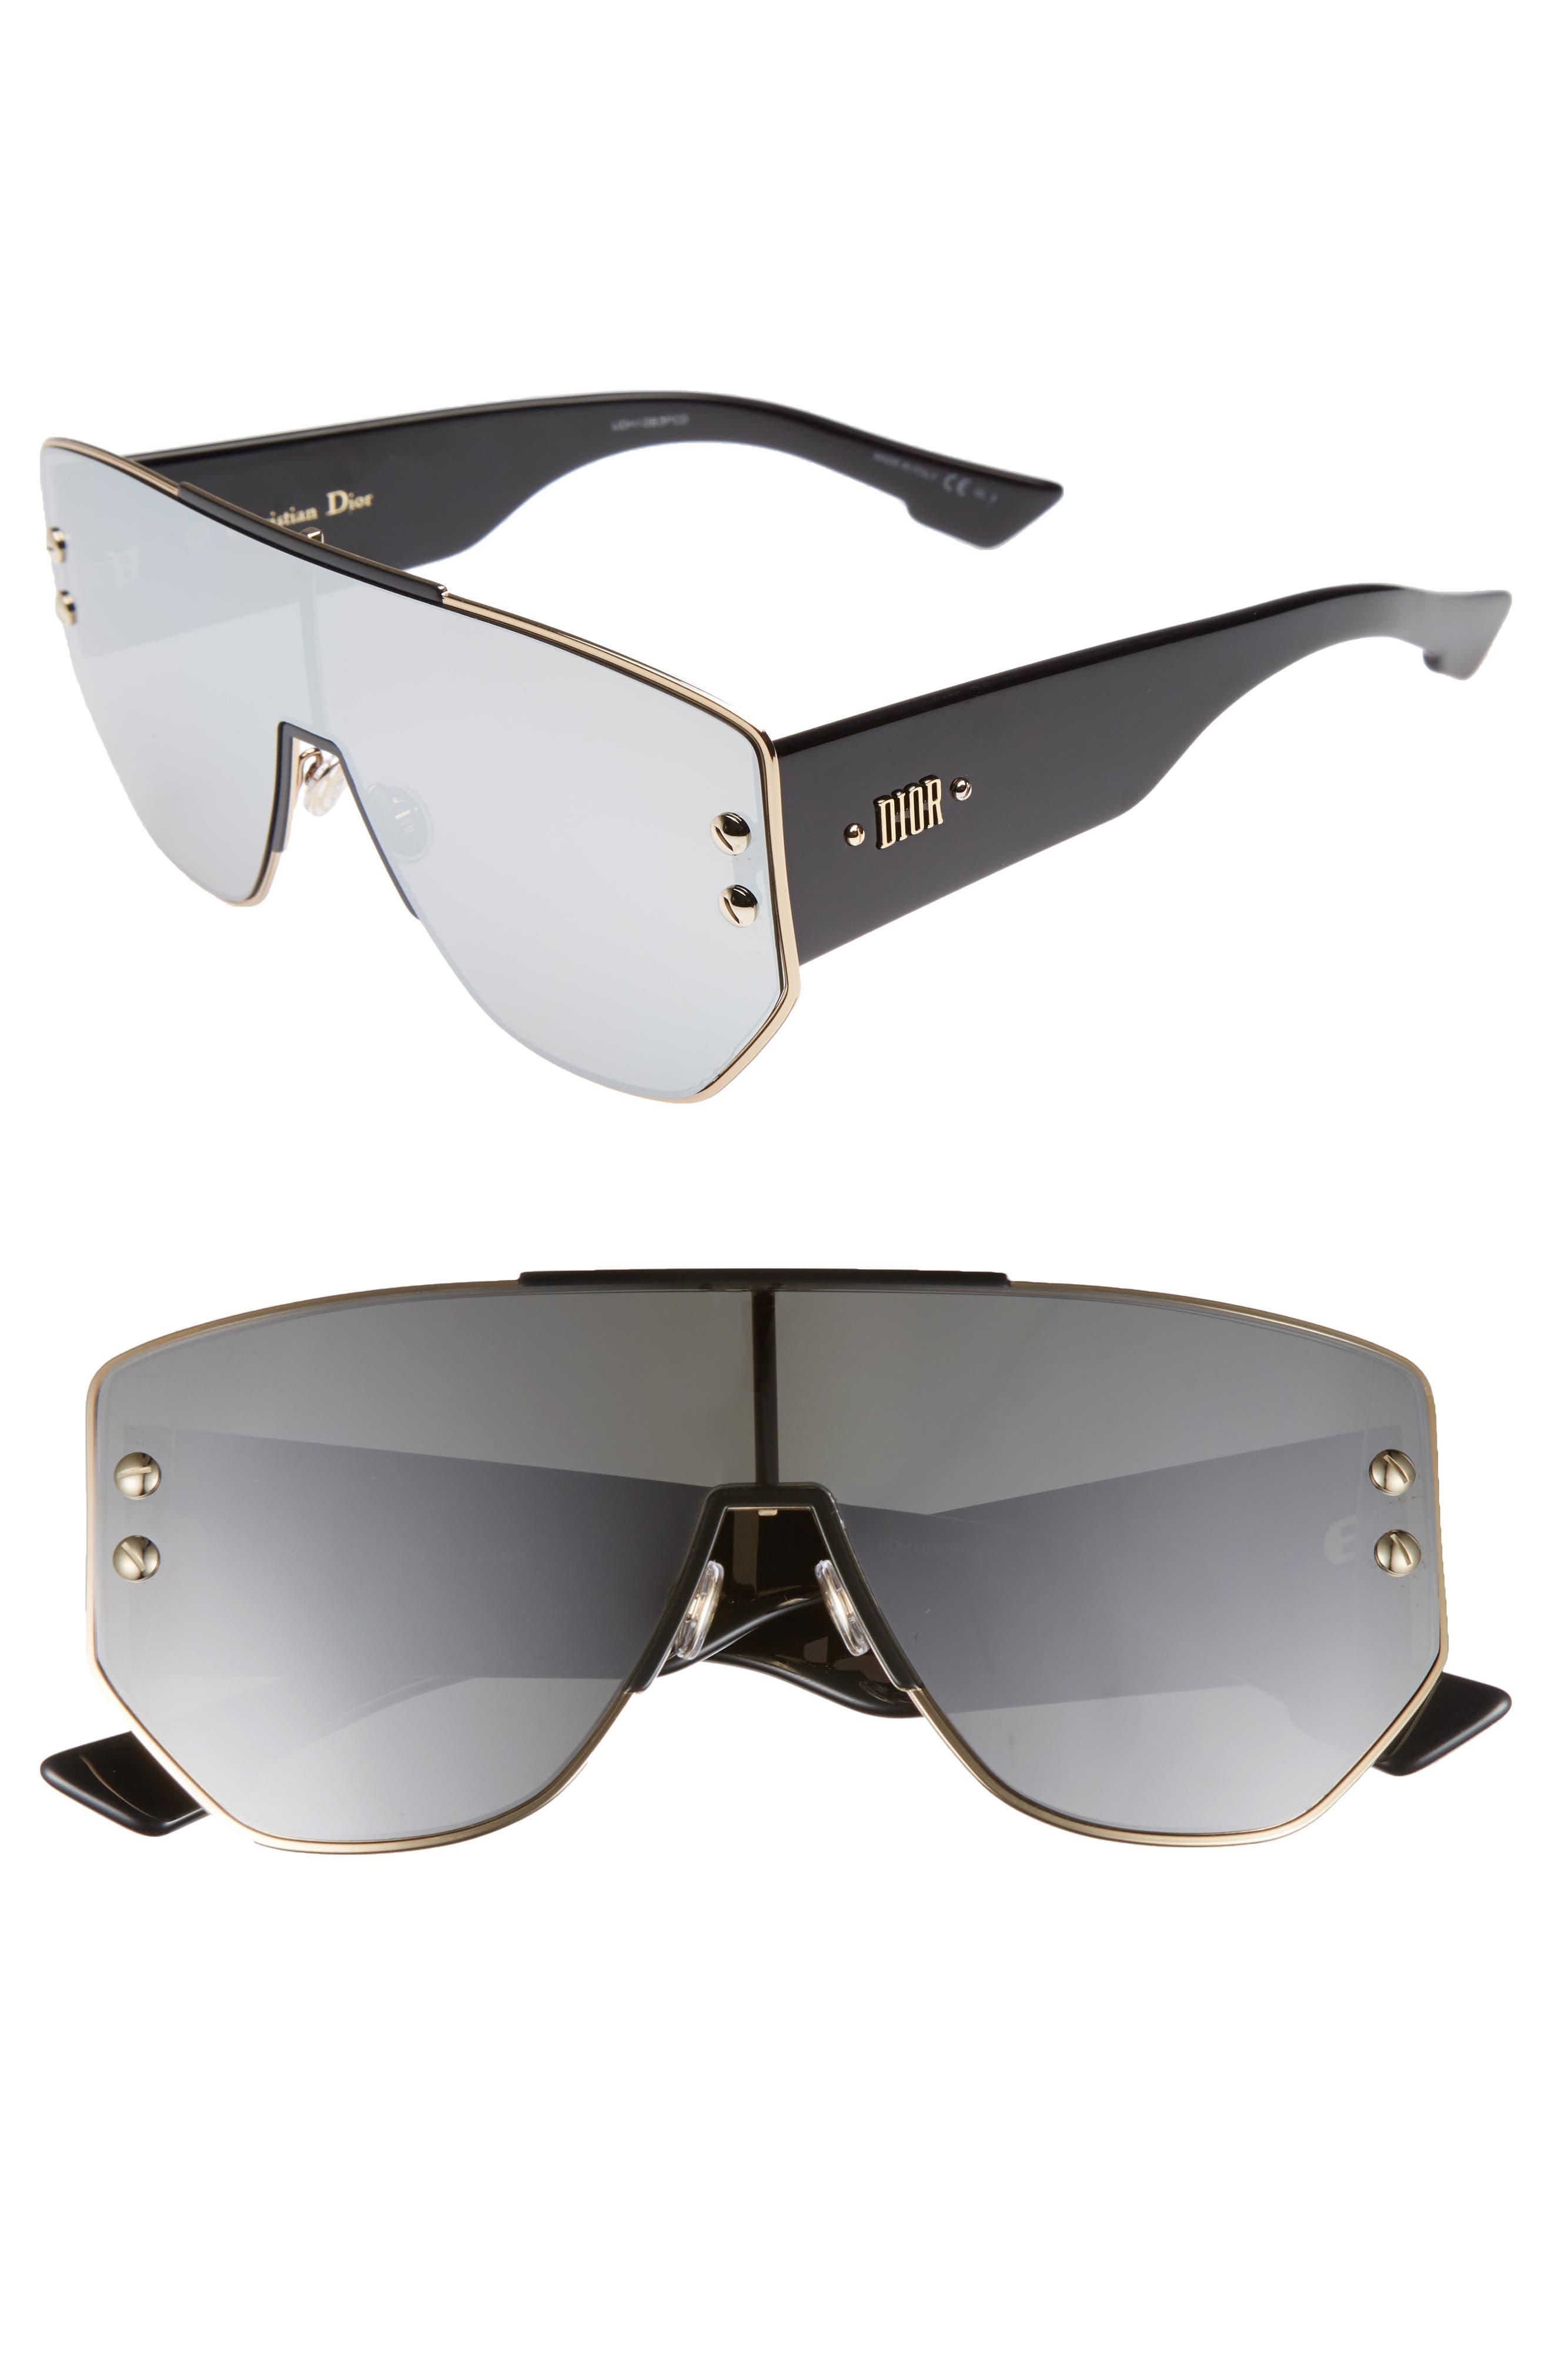 Dior 72mm Rimless Shield Sunglasses